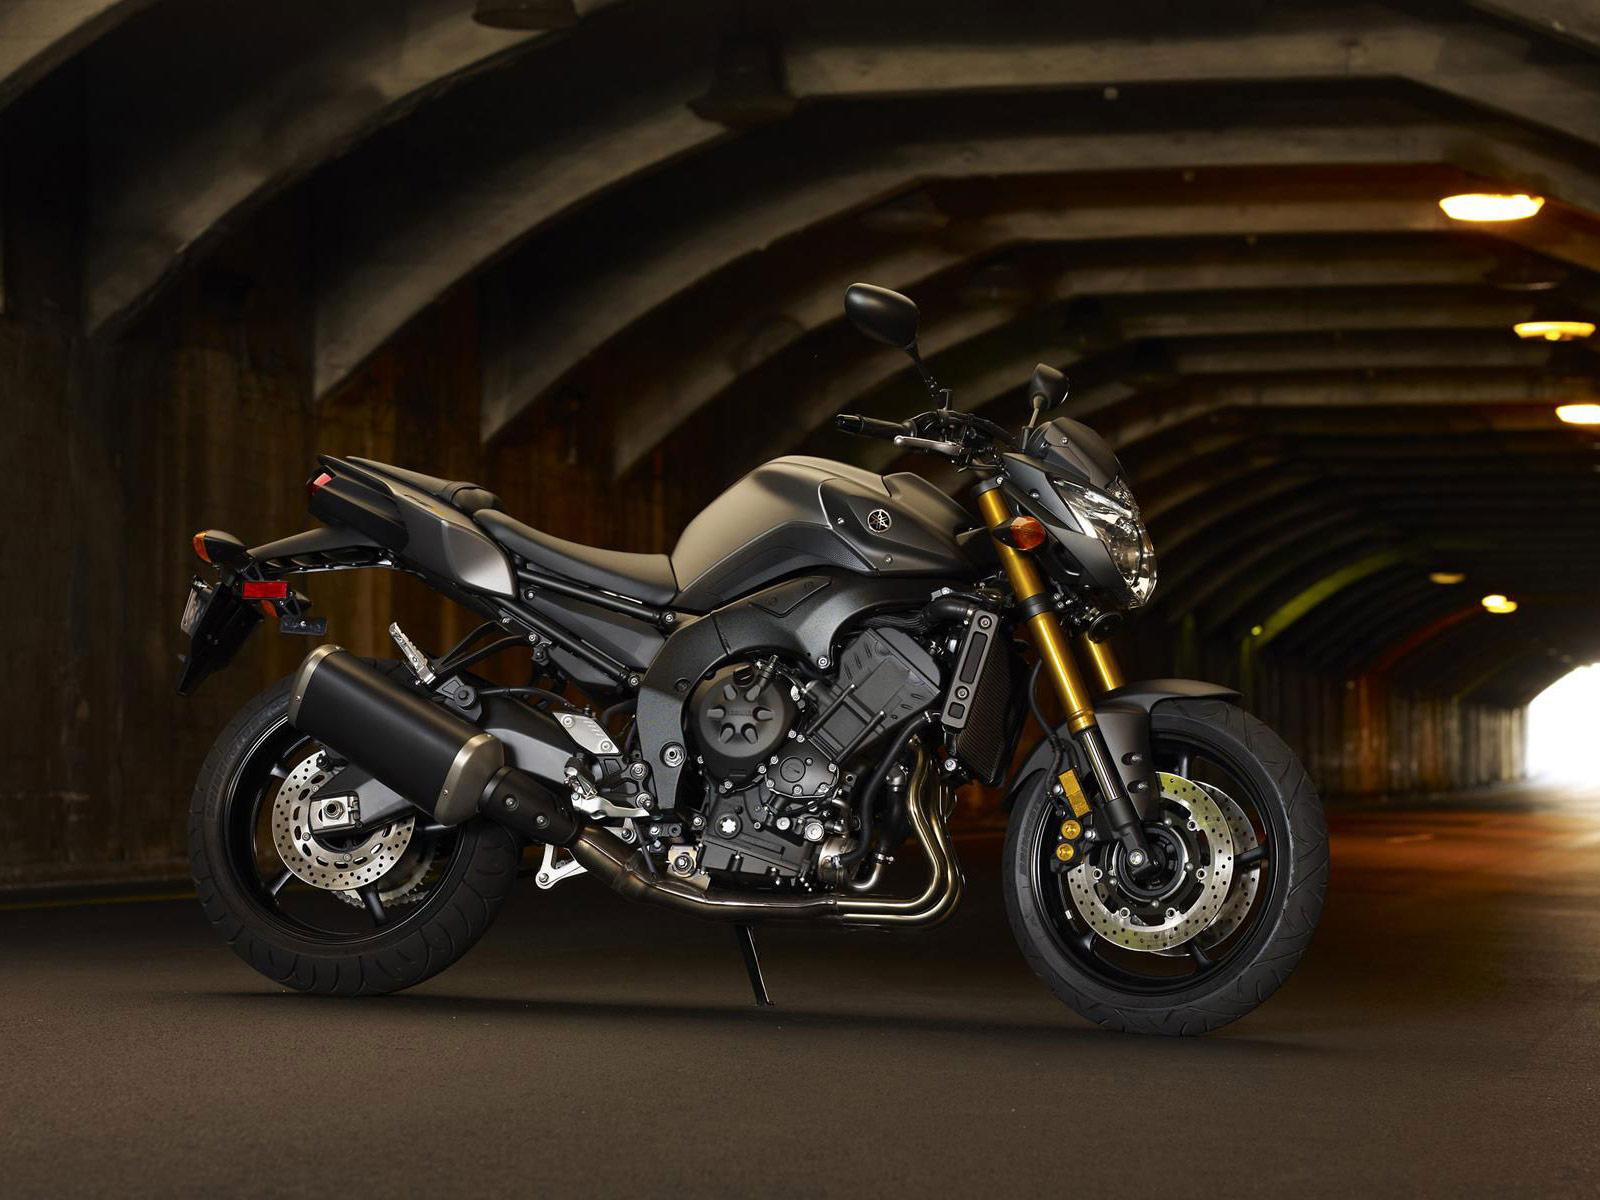 2012 YAMAHA FZ8 Motorcycle Insurance Information